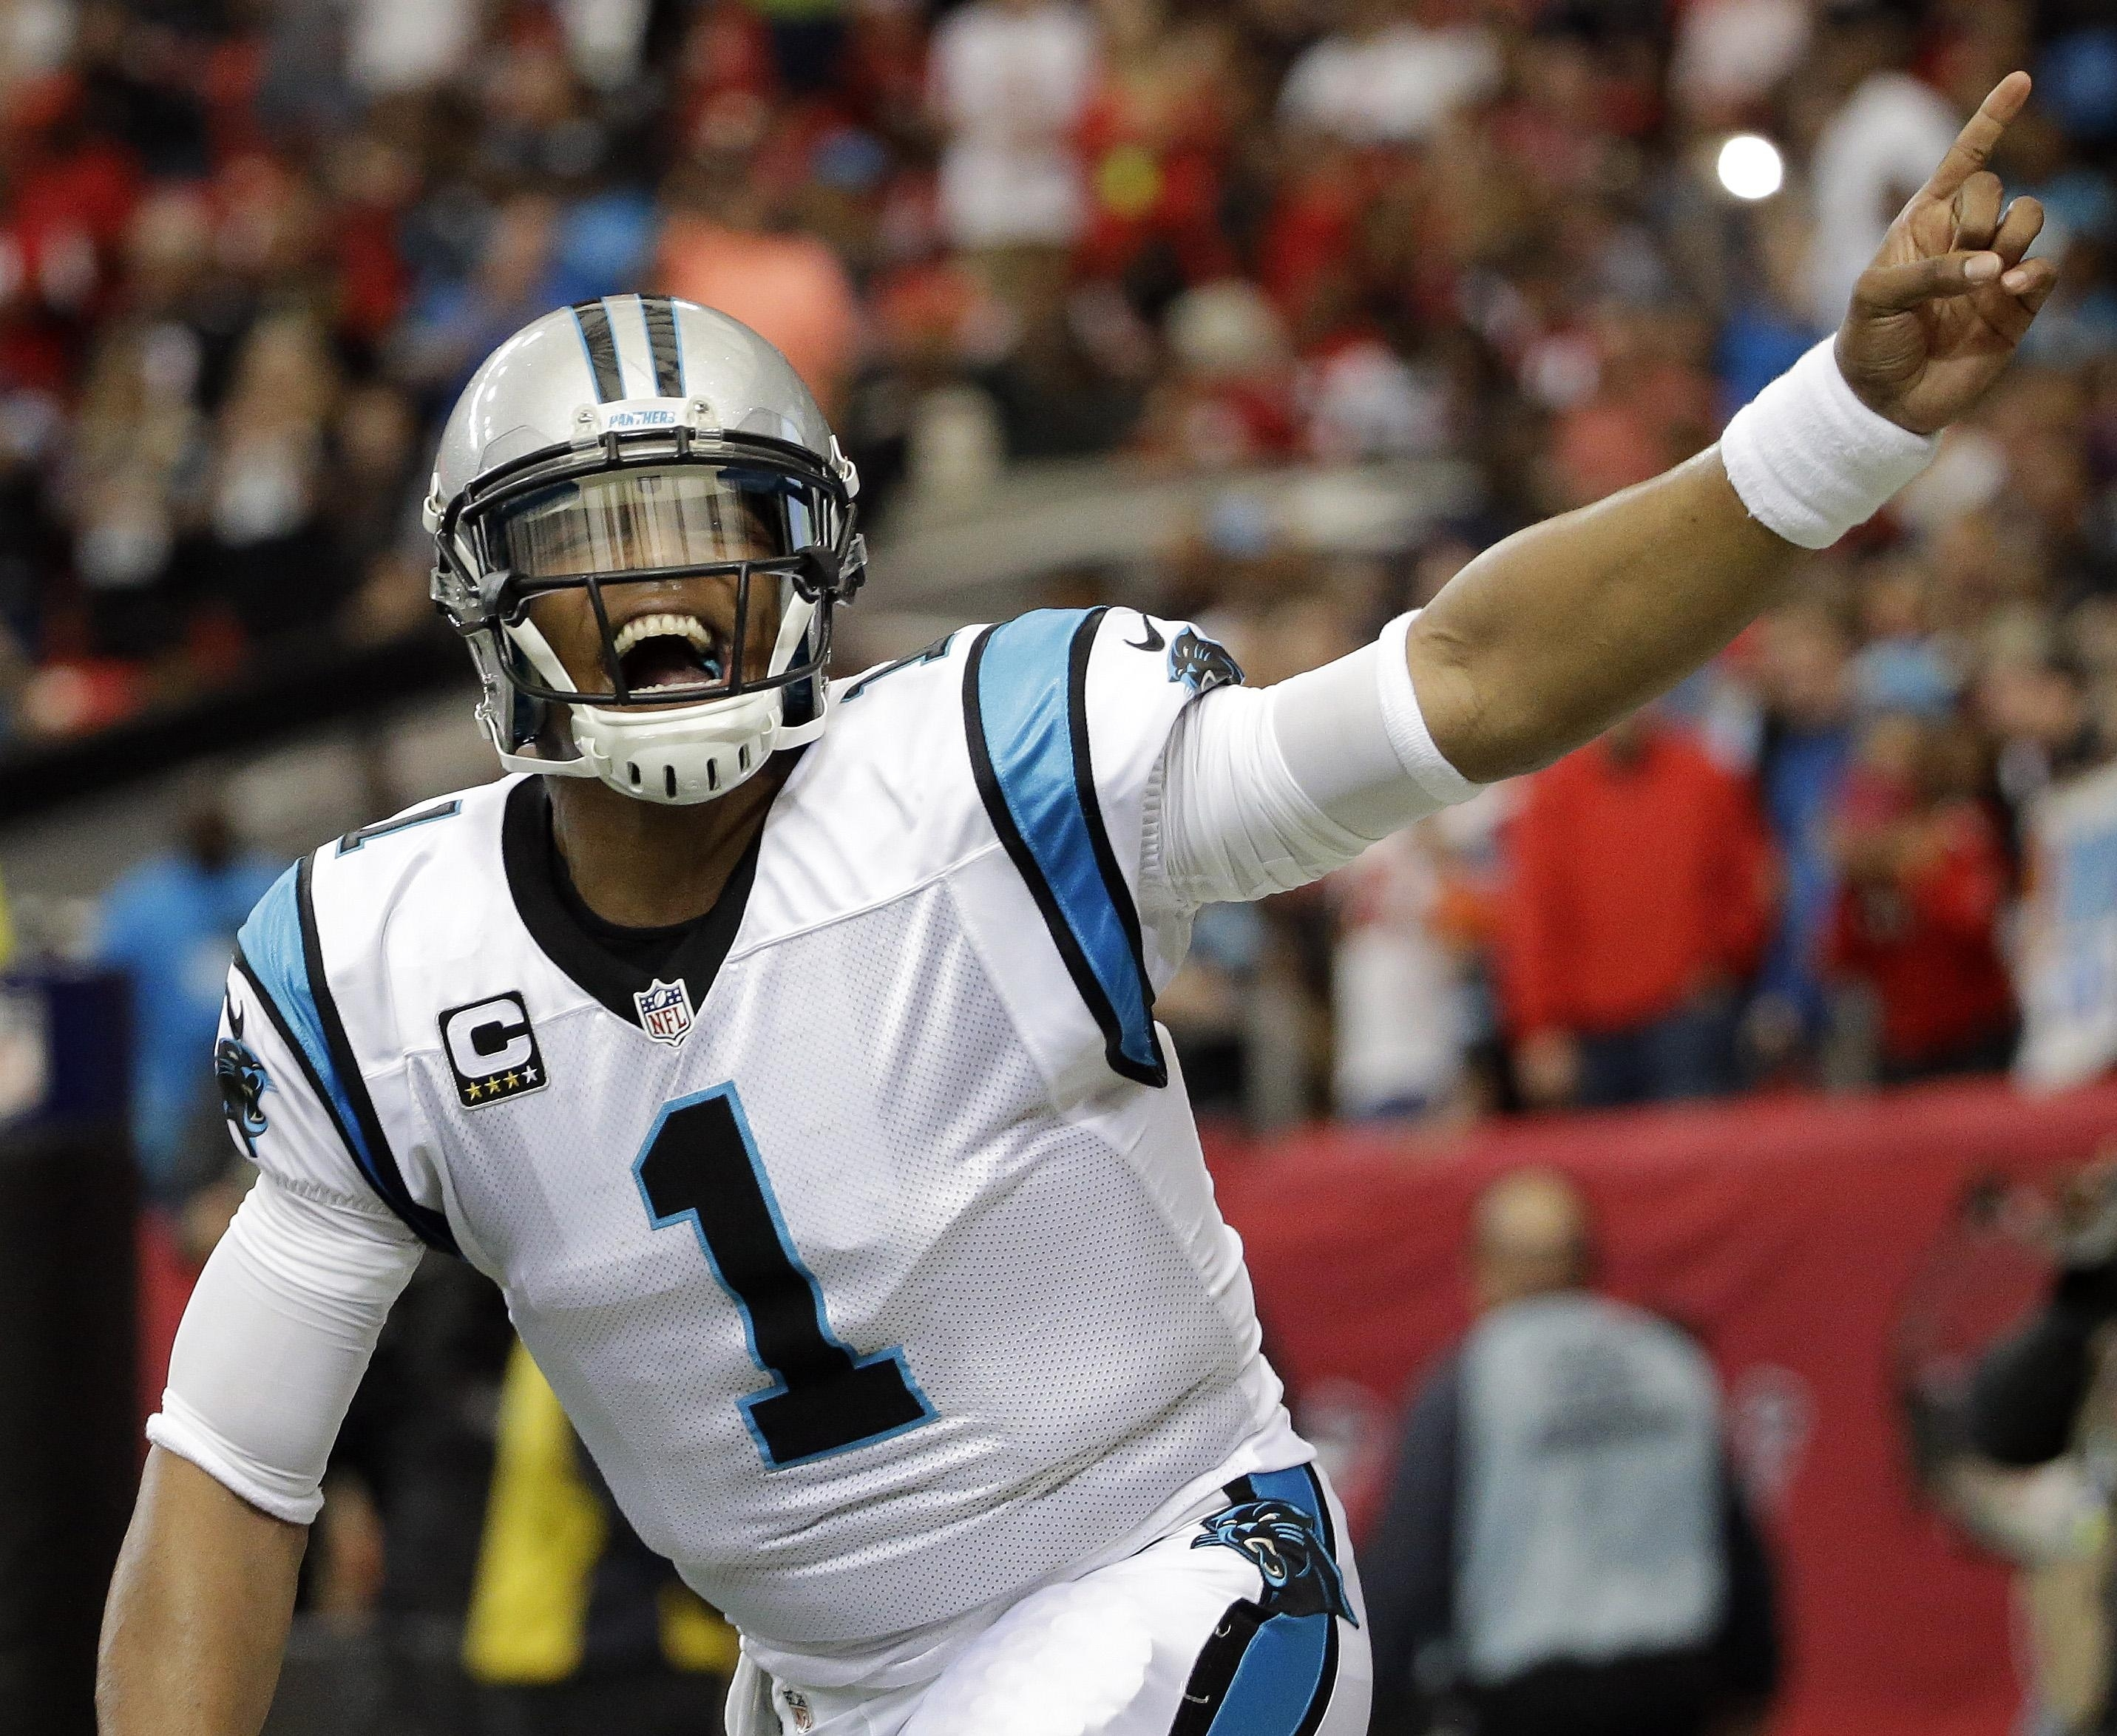 Mvp Cam Newton Headlines Ap's Nfl Awards | The Spokesman-Review inside Vote For Mvp Super Bowl 50